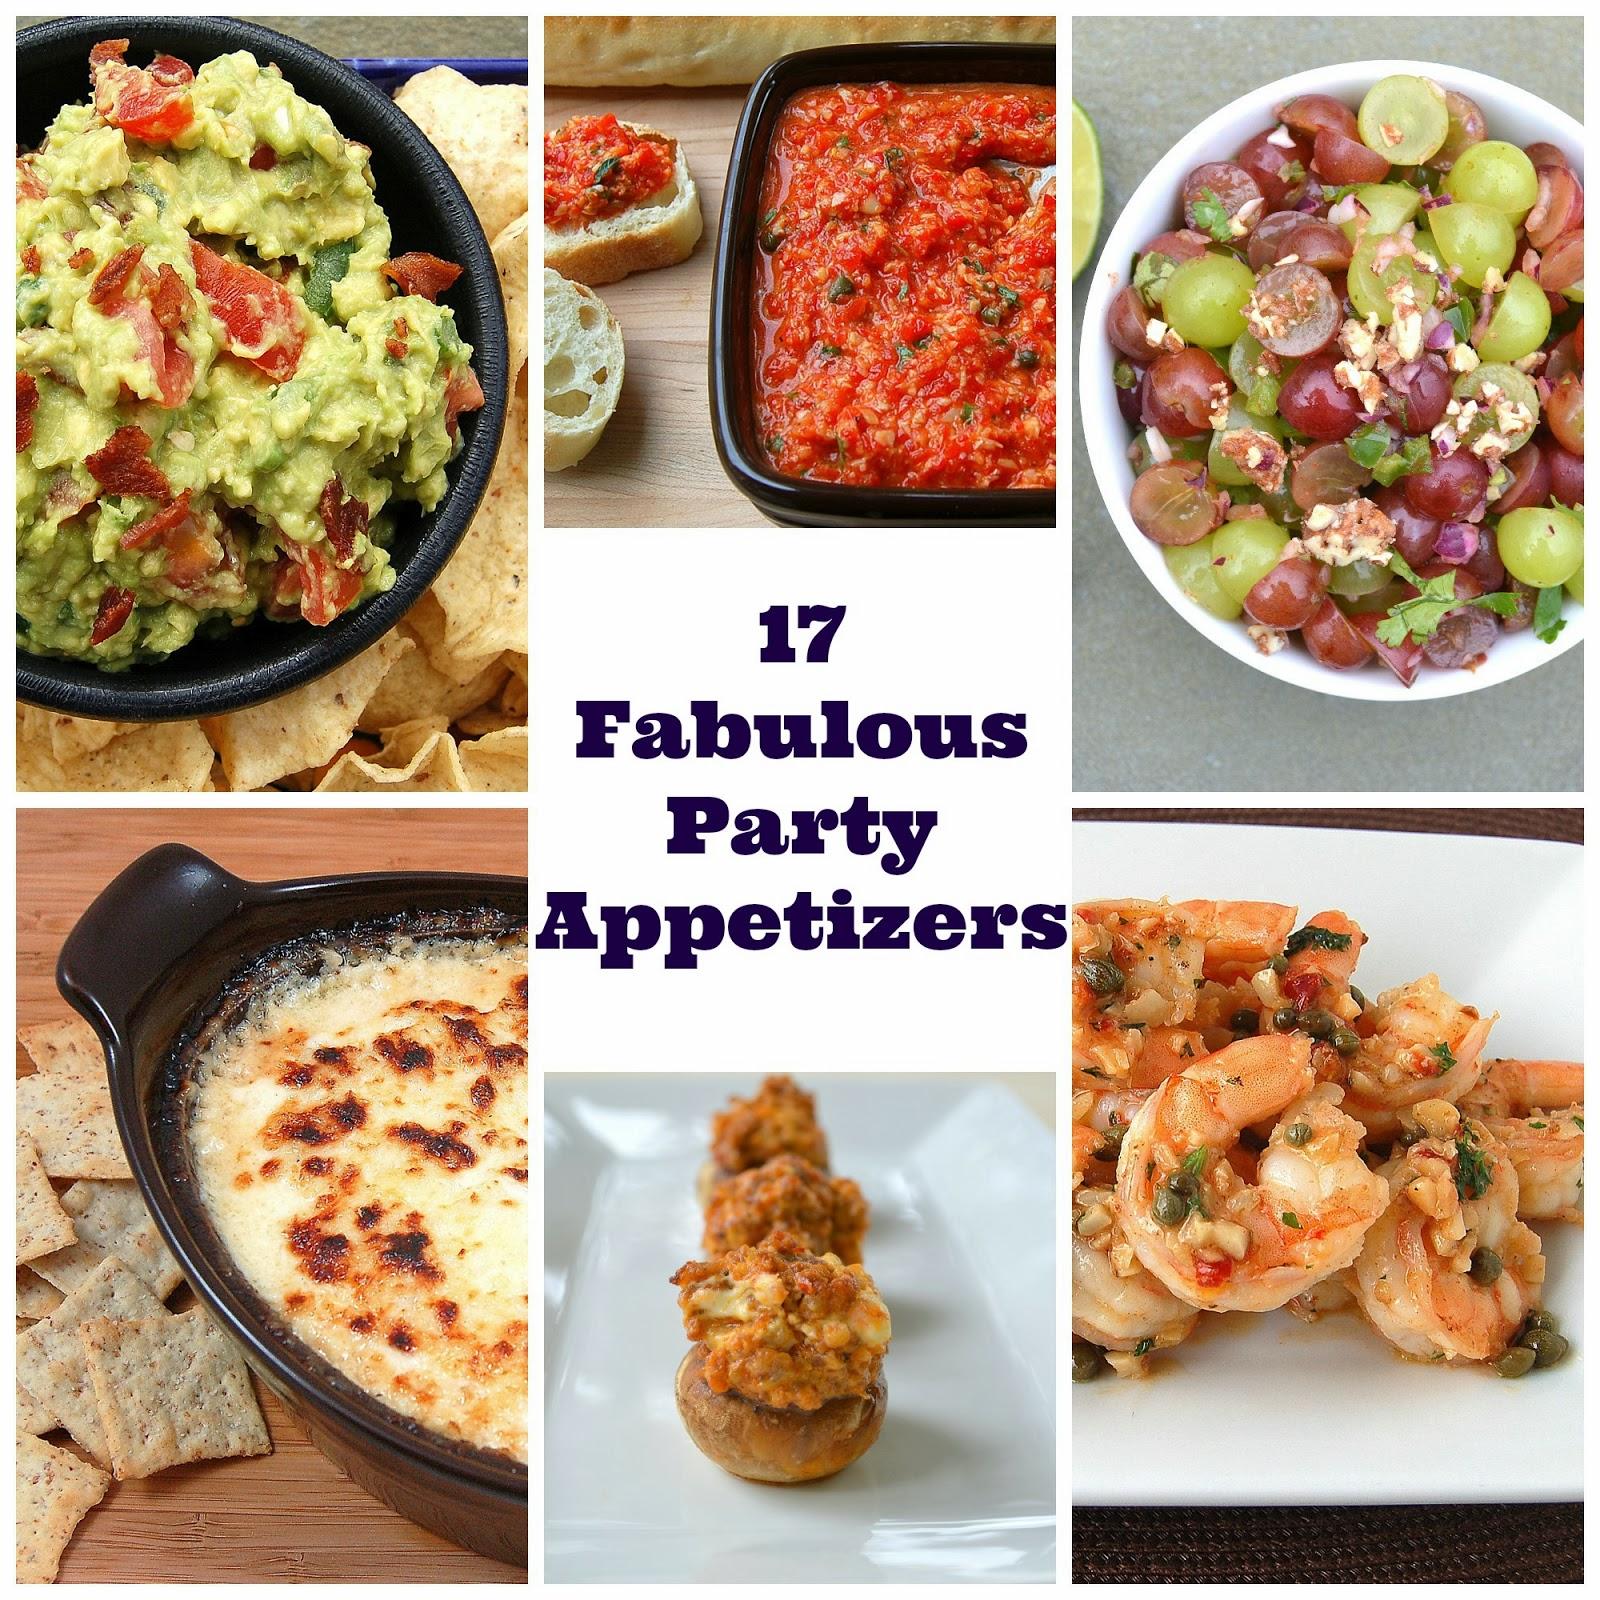 17 Fabulous Party Appetizer Recipes